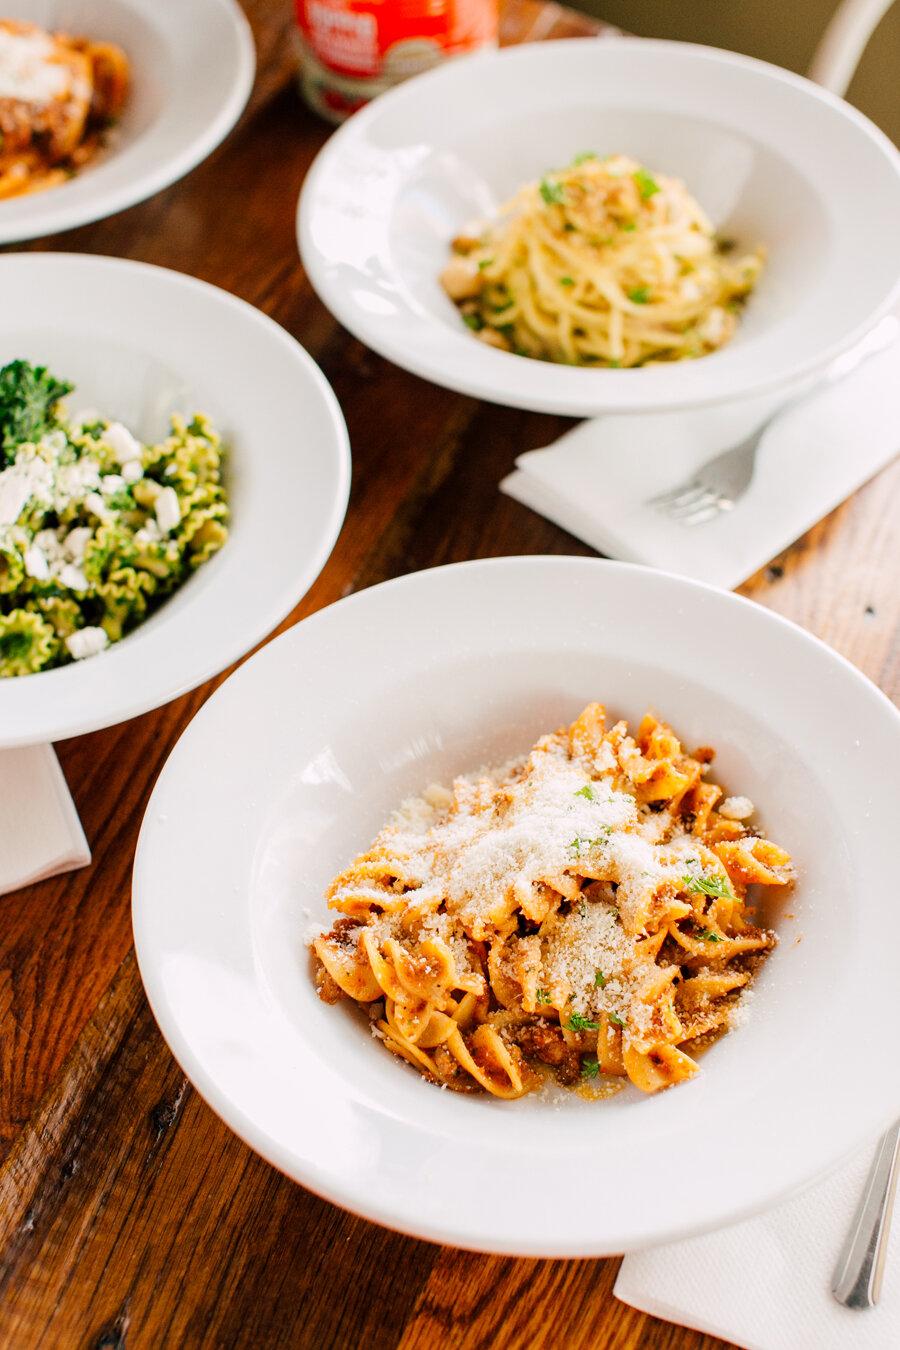 027-Seattle-food-photographer-katheryn-moran-due-cucina-italiana-pasta.jpg